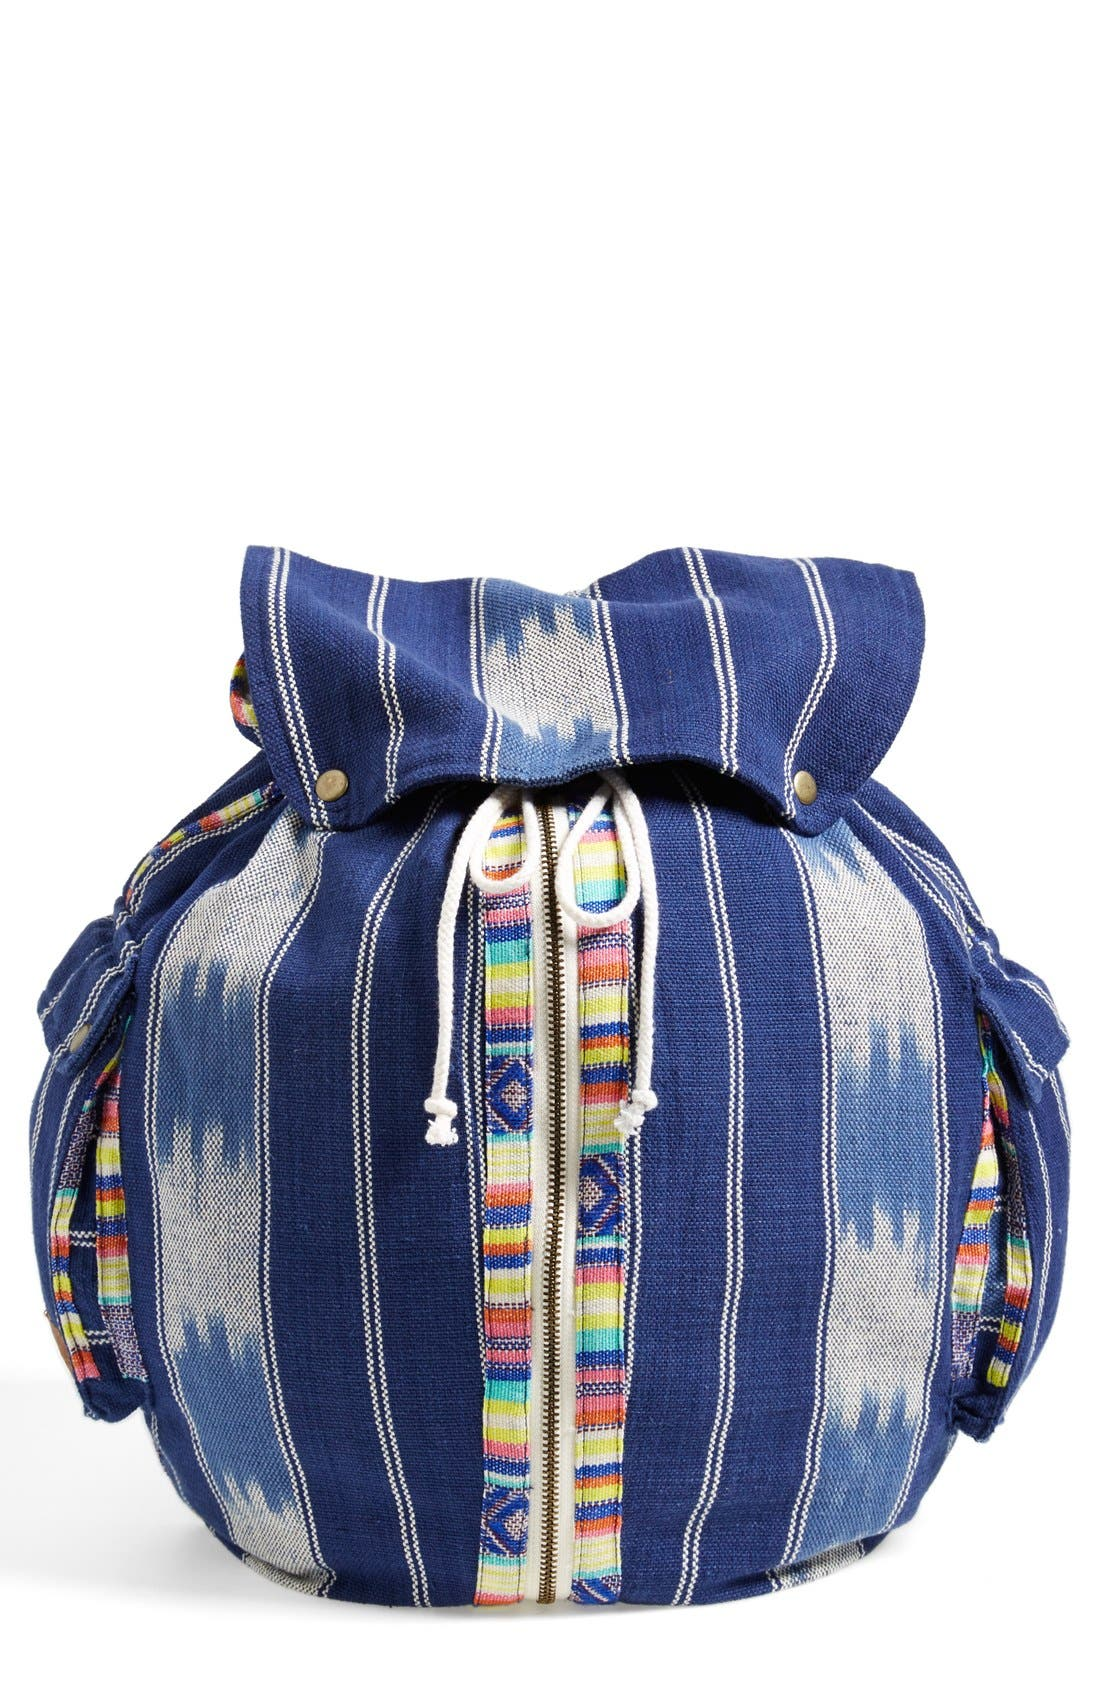 Main Image - Billabong 'Indian Surf' Woven Backpack